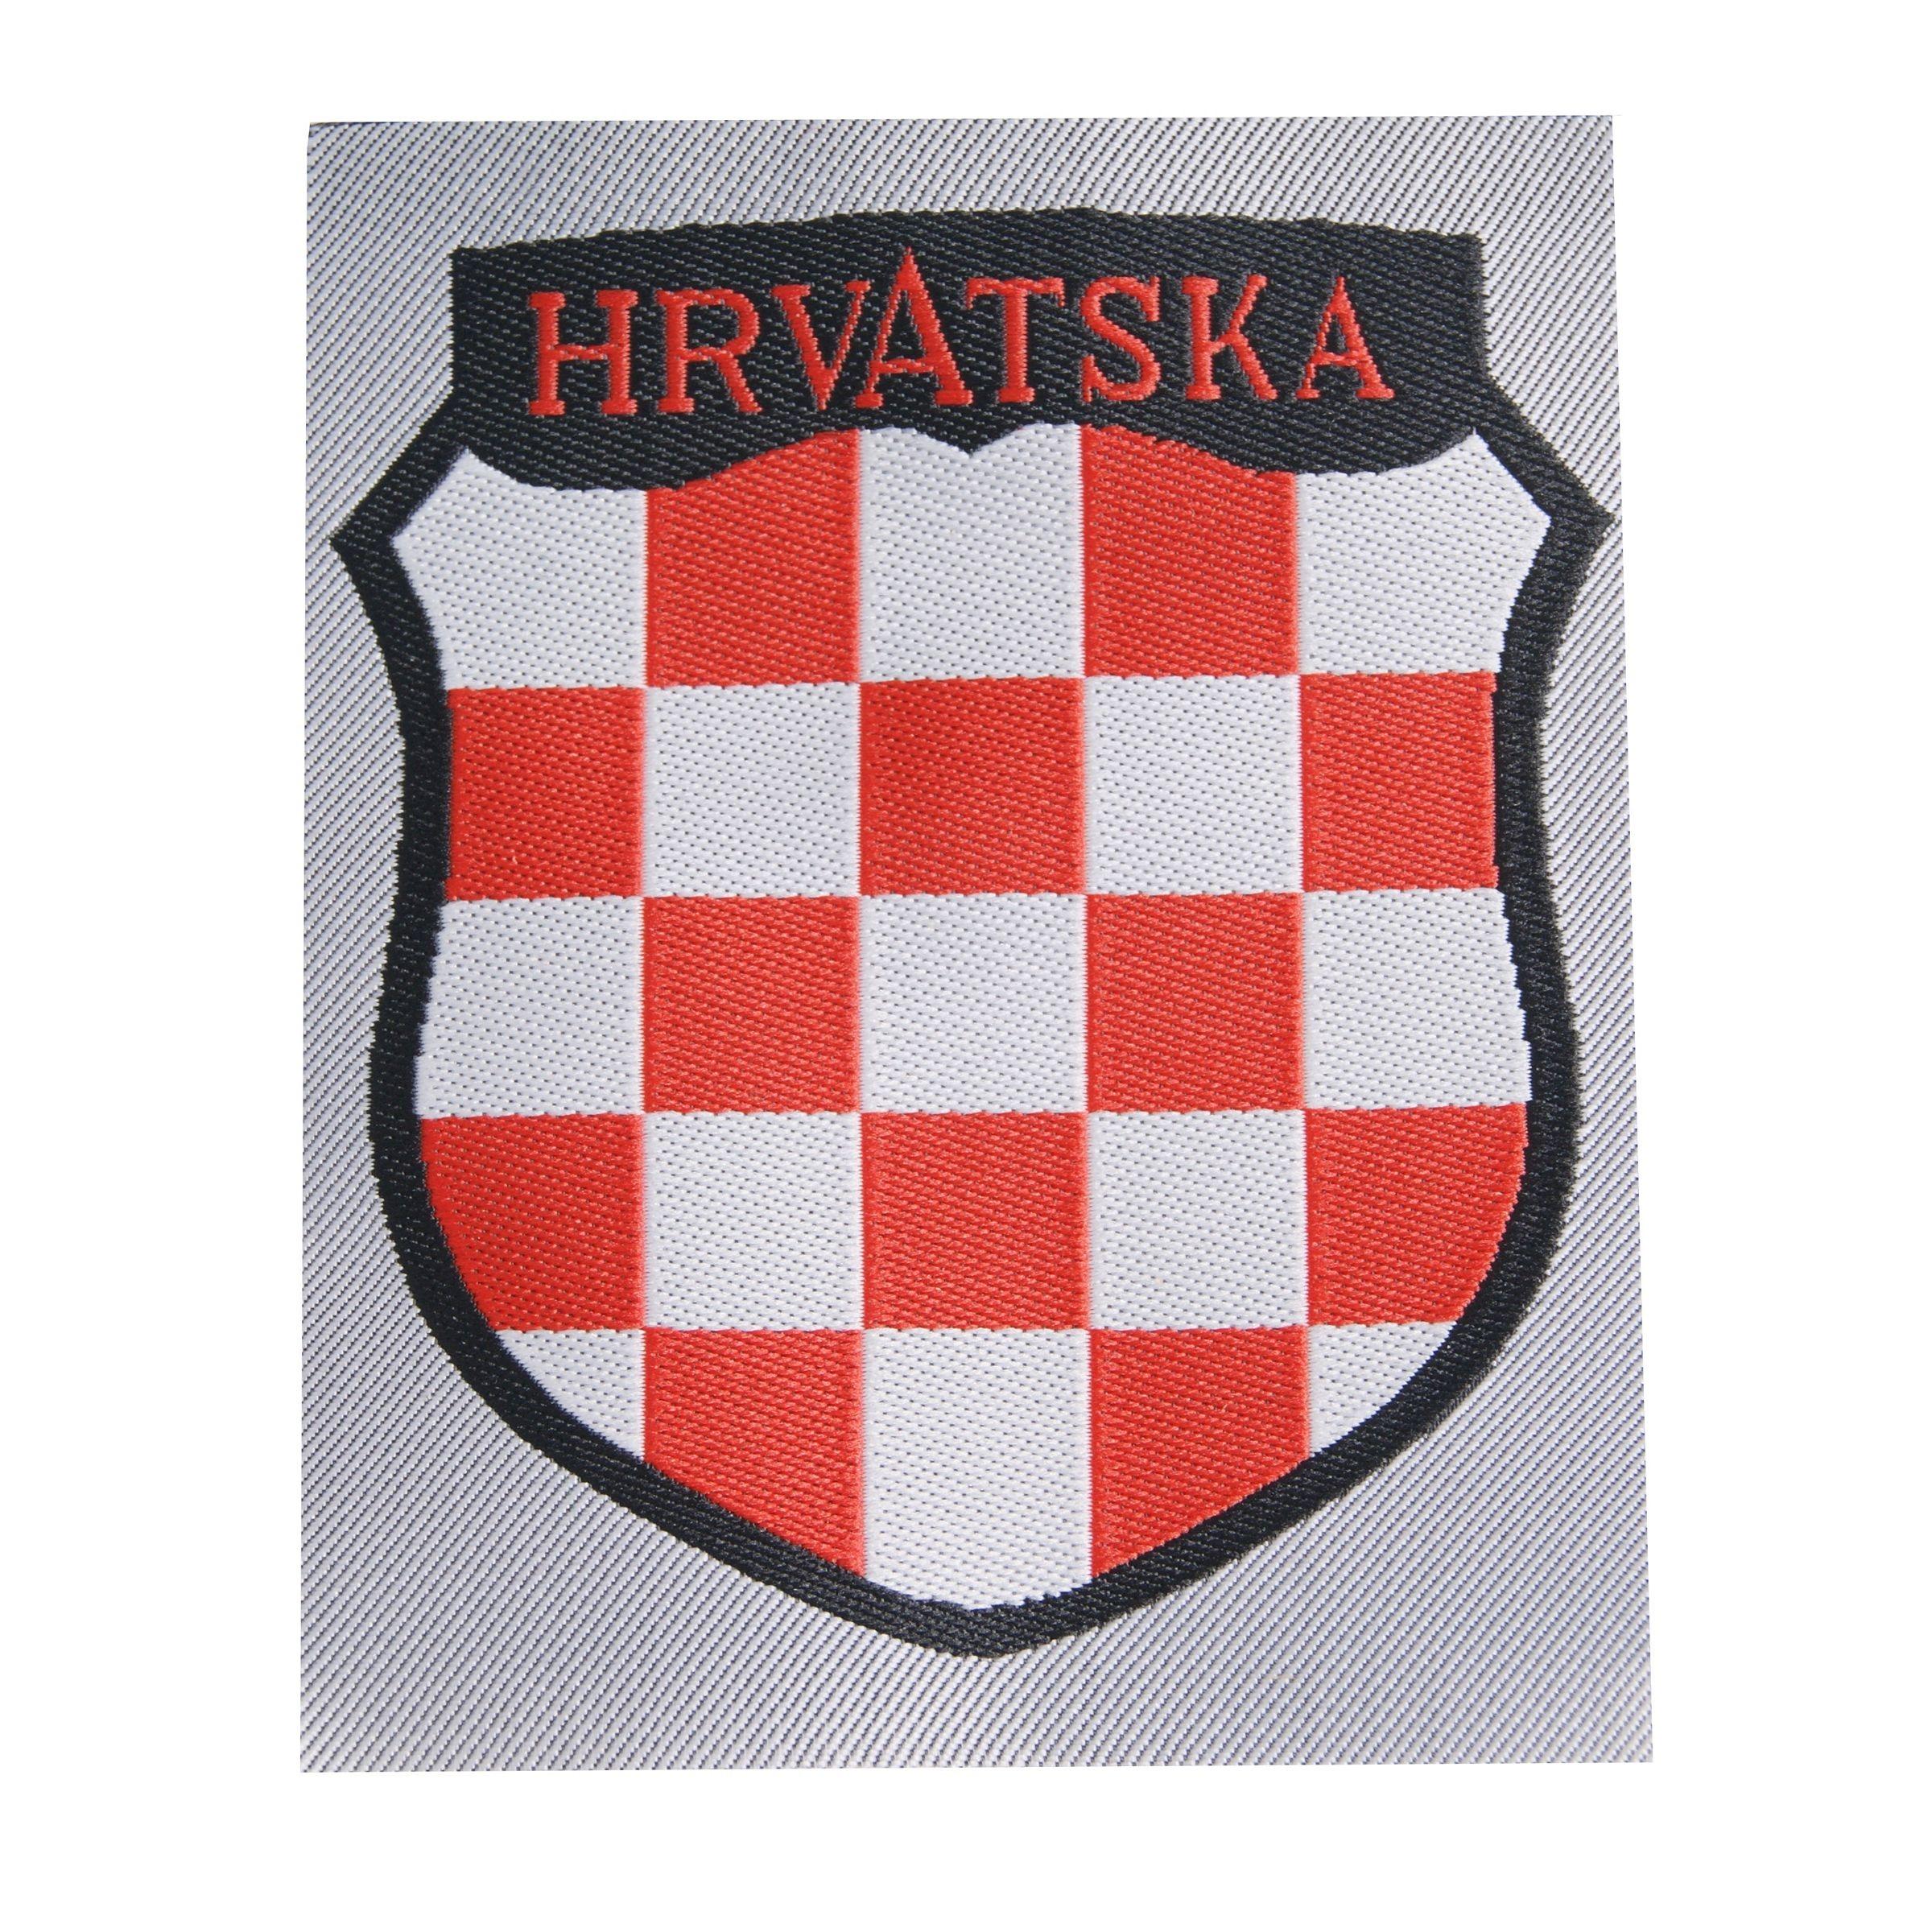 Hrvatska patch - BeVo - repro